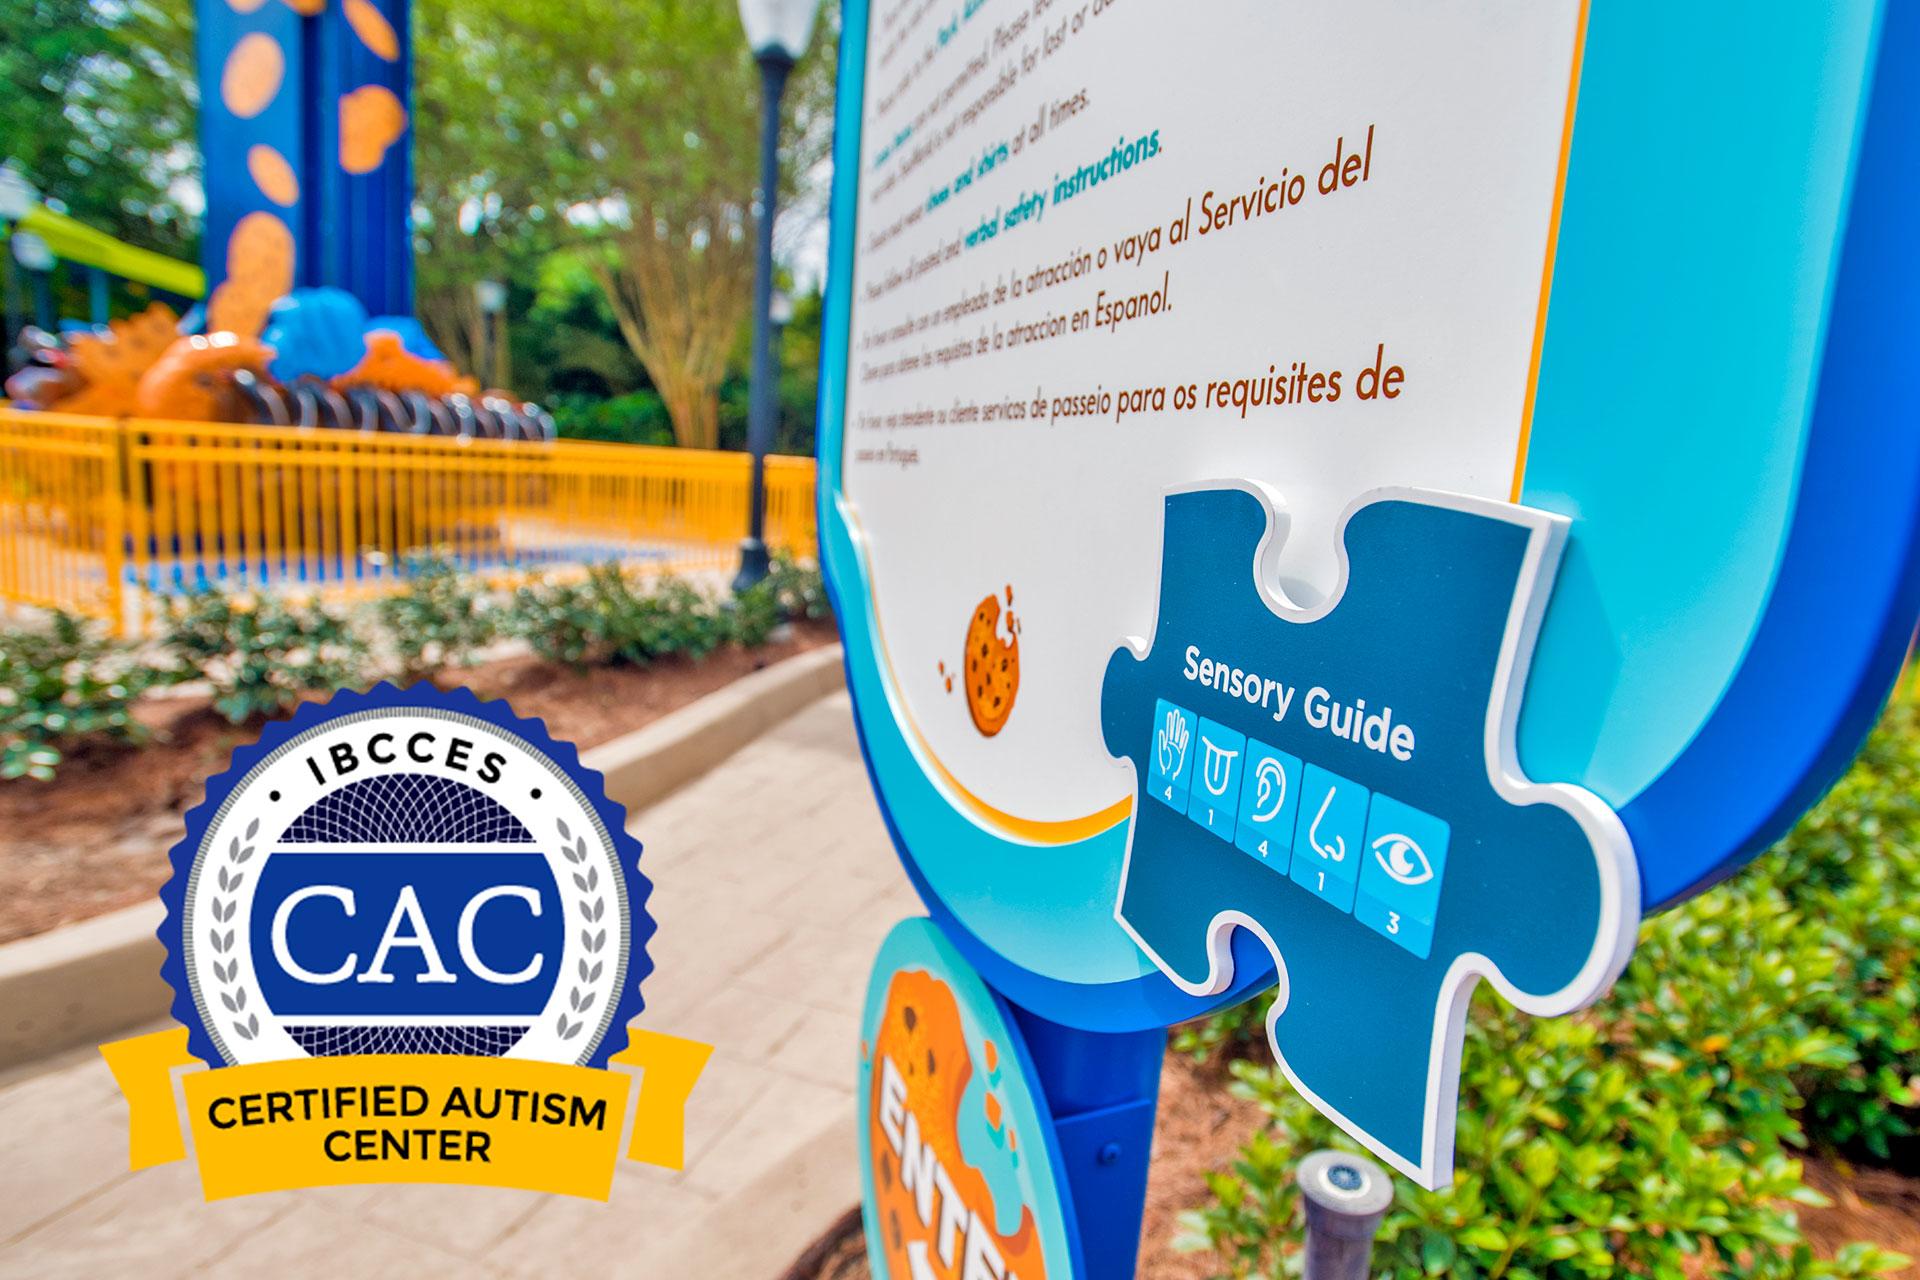 SeaWorld Orlando Resort - Certified Autism Center; Courtesy of SeaWorld Orlando Resort